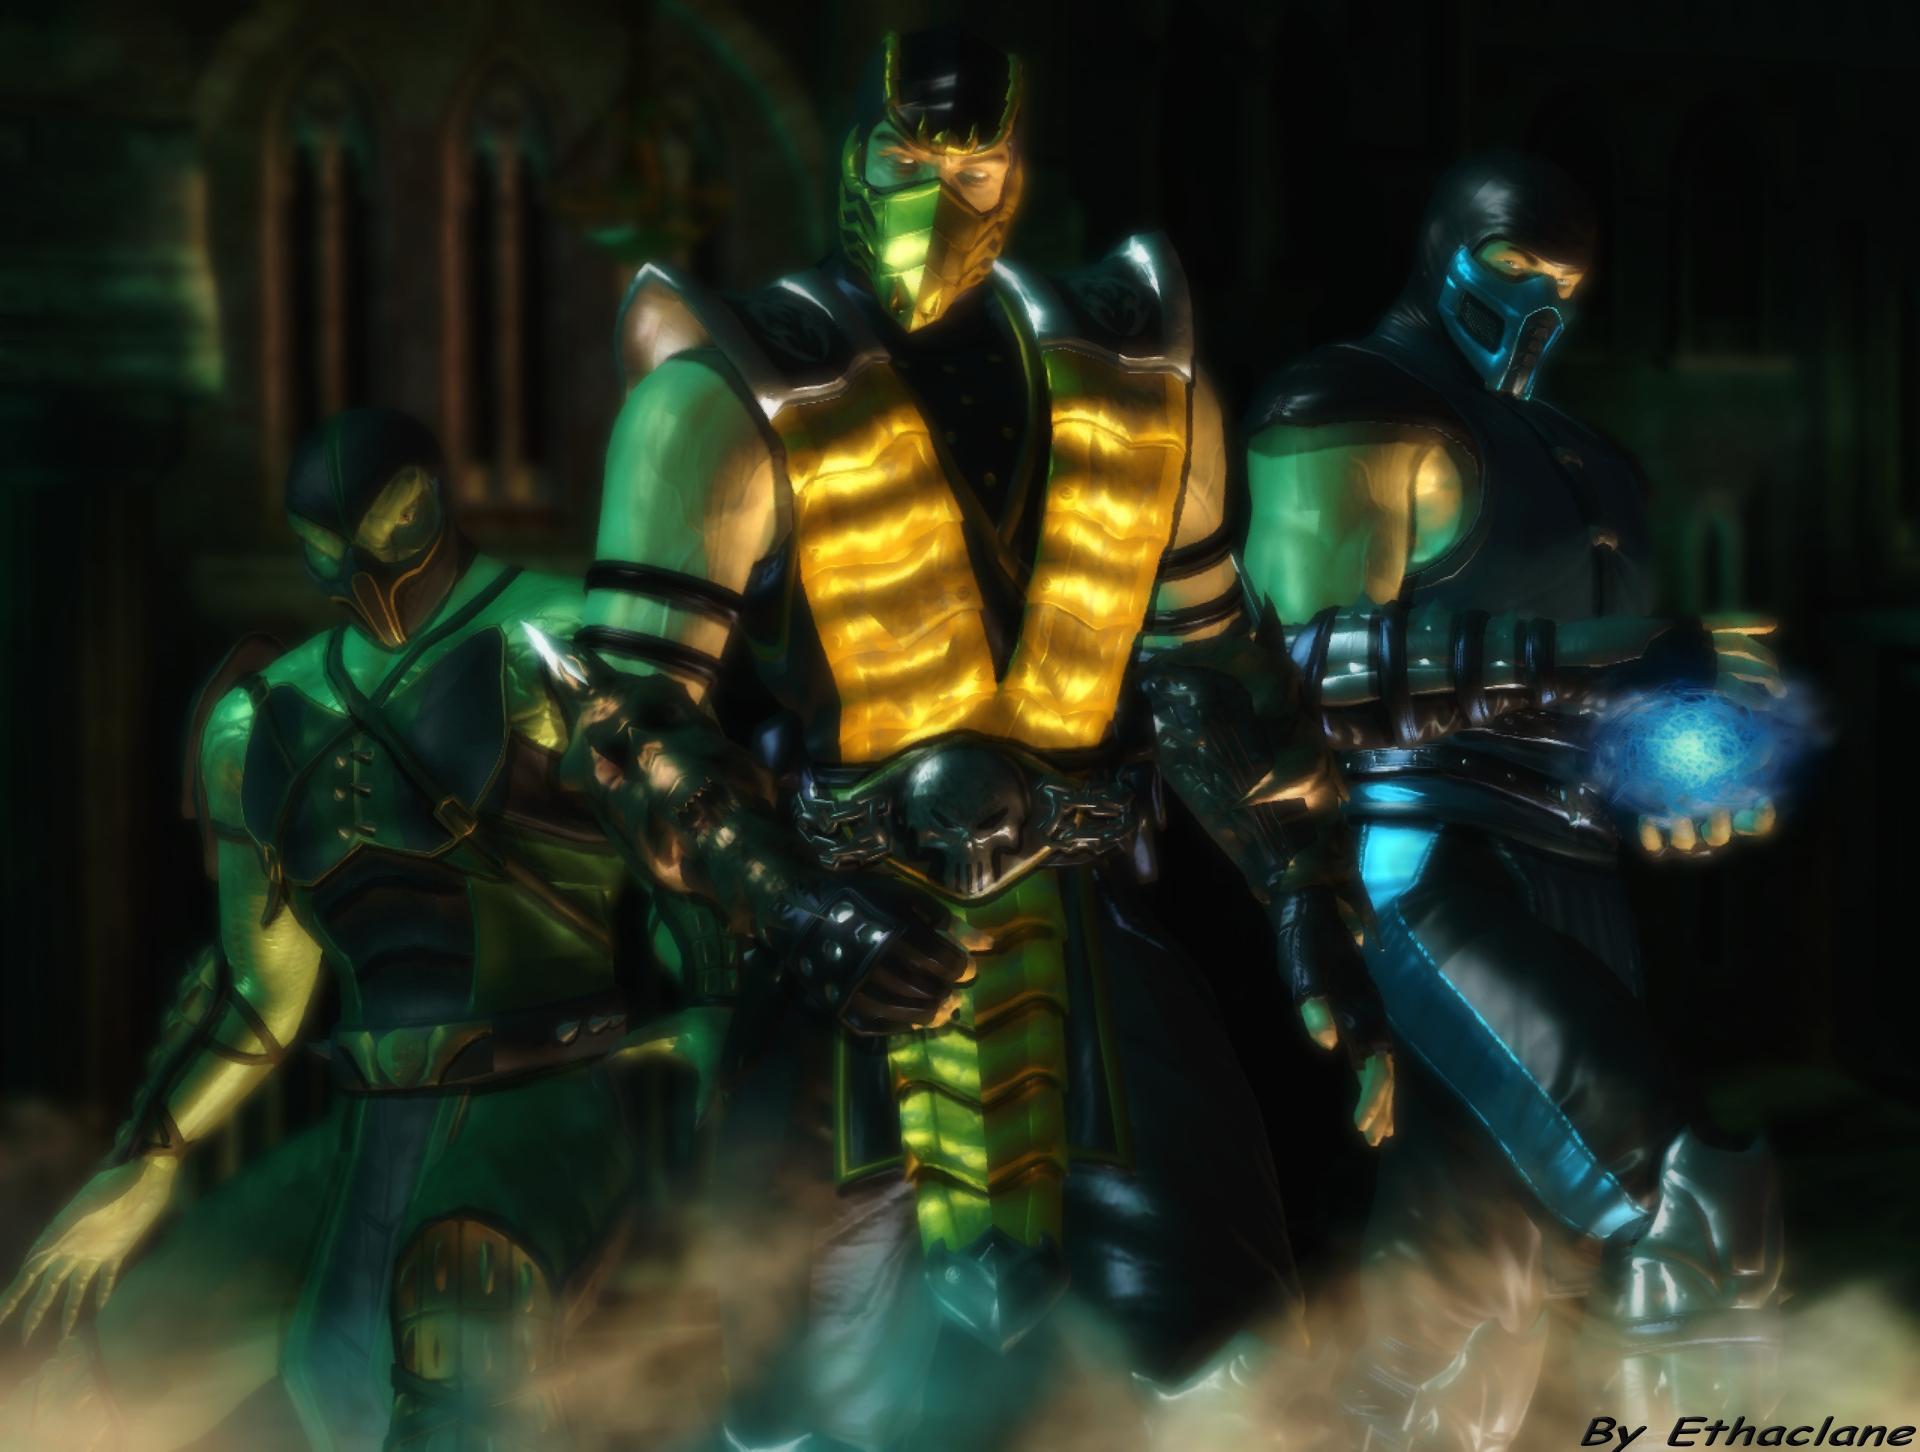 Mortal Kombat Wallpaper Scorpion Subzero Reptile By Ethaclane On